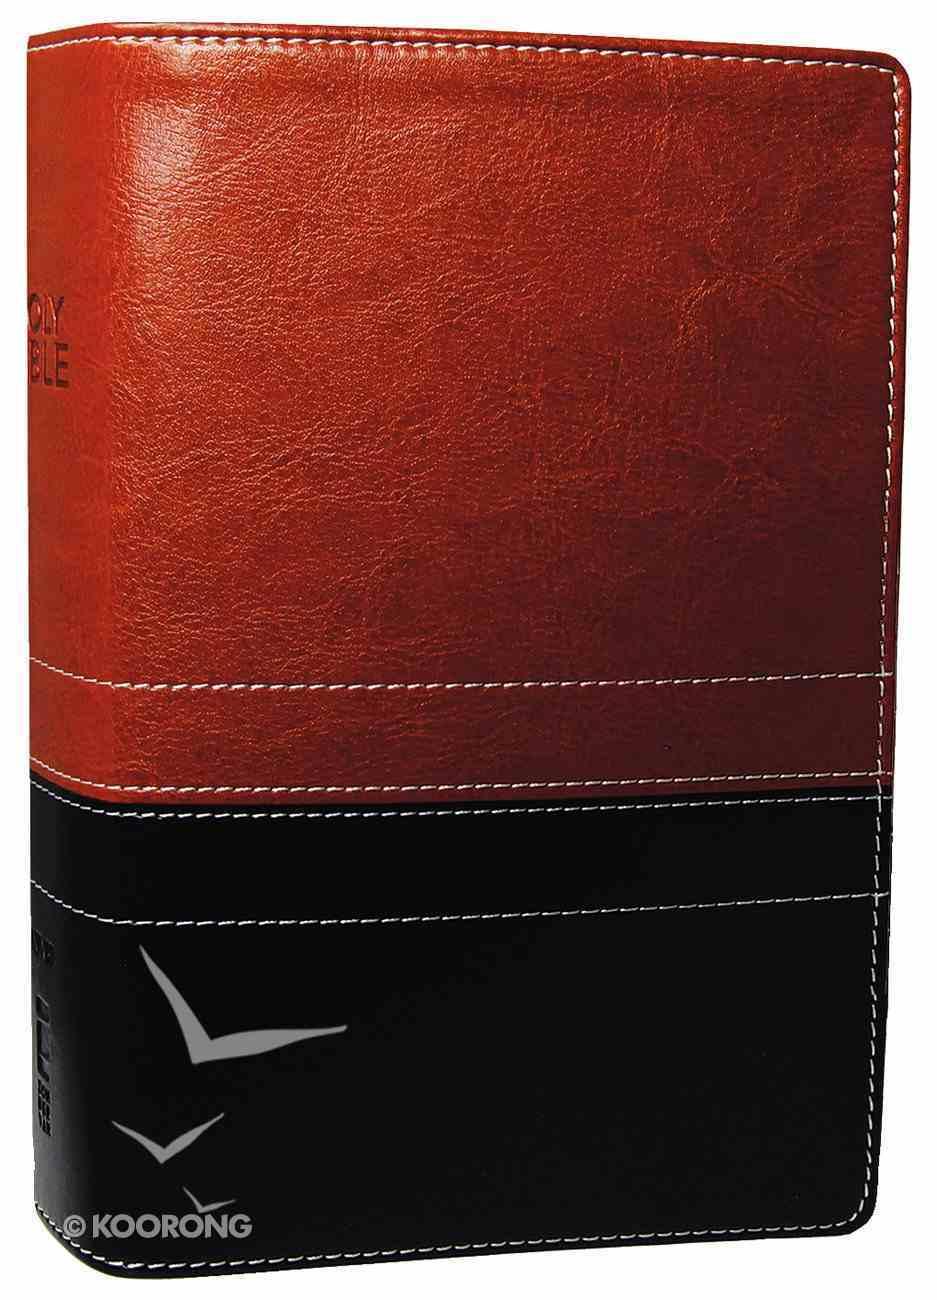 NIV Compact Giant Print Black/Sierra (Black Letter Edition) Premium Imitation Leather